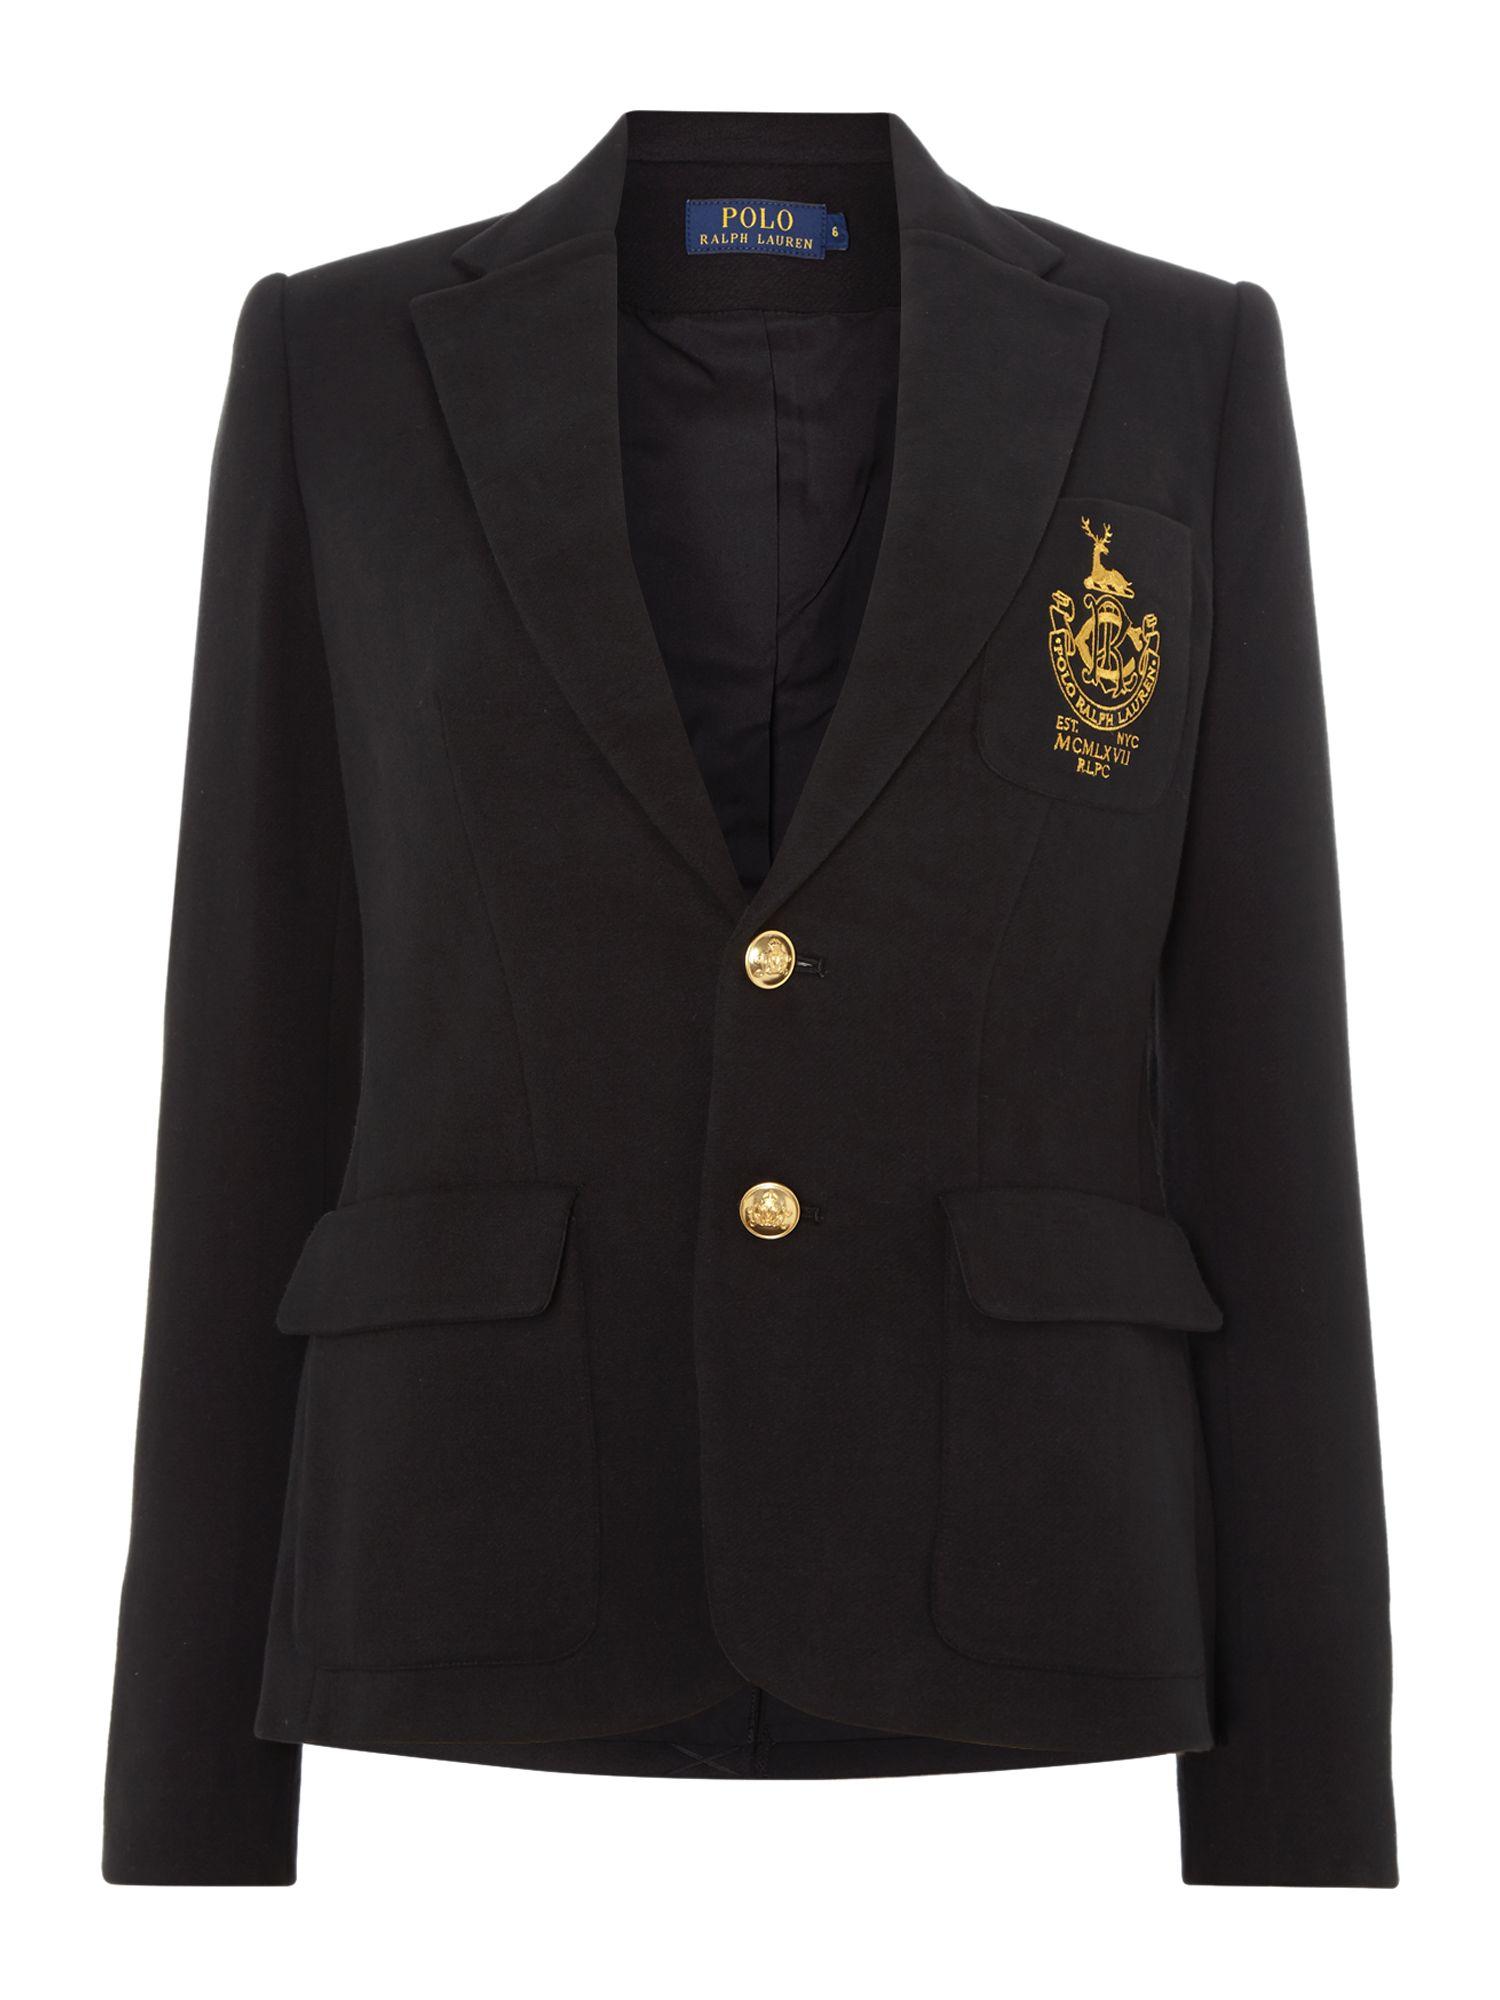 polo ralph lauren long sleeved crested blazer in black lyst. Black Bedroom Furniture Sets. Home Design Ideas